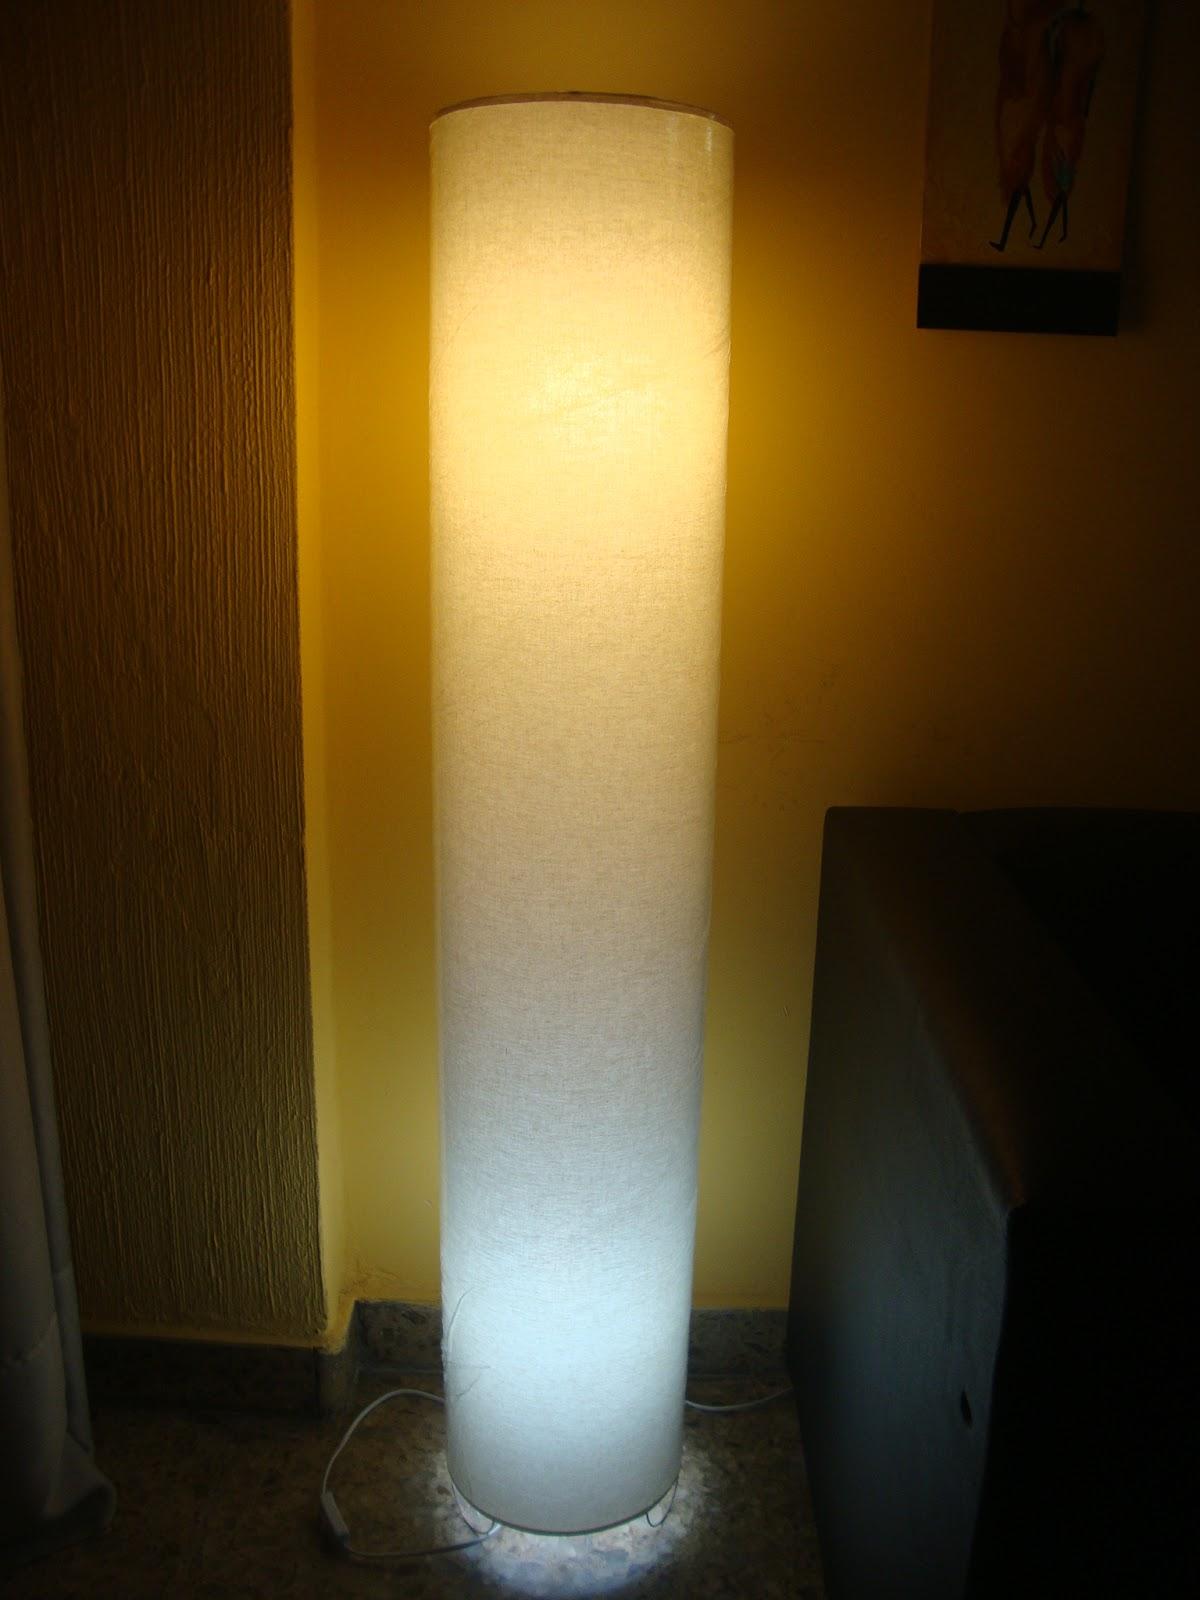 Calida iluminacion lamparas de pie tubo - Iluminacion de pie ...